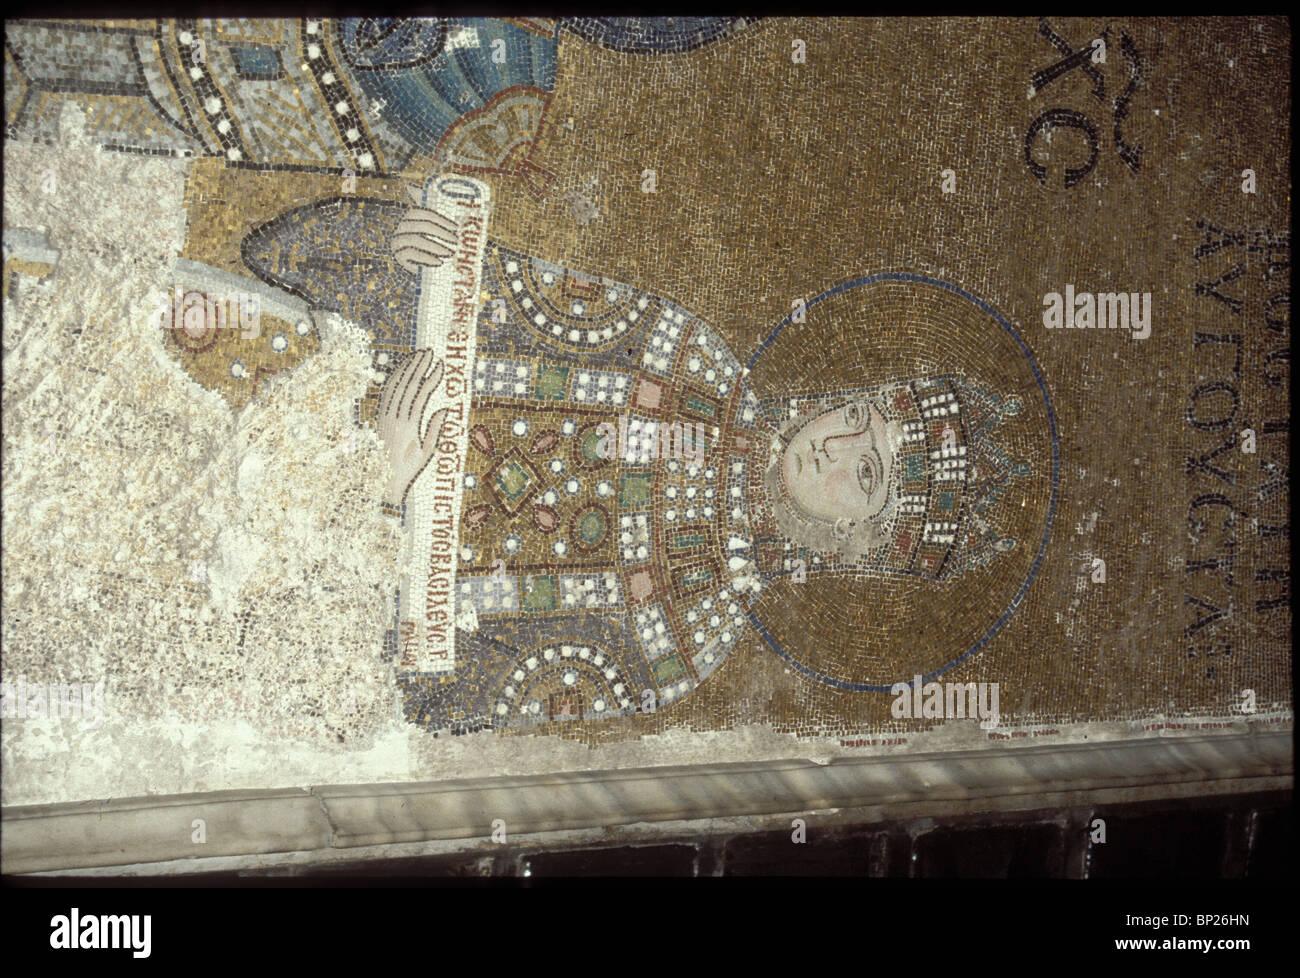 1101. HAGIA SOPHIA, 11TH. C. MOSAIC DEPICTING EMPRESS ZOE - Stock Image